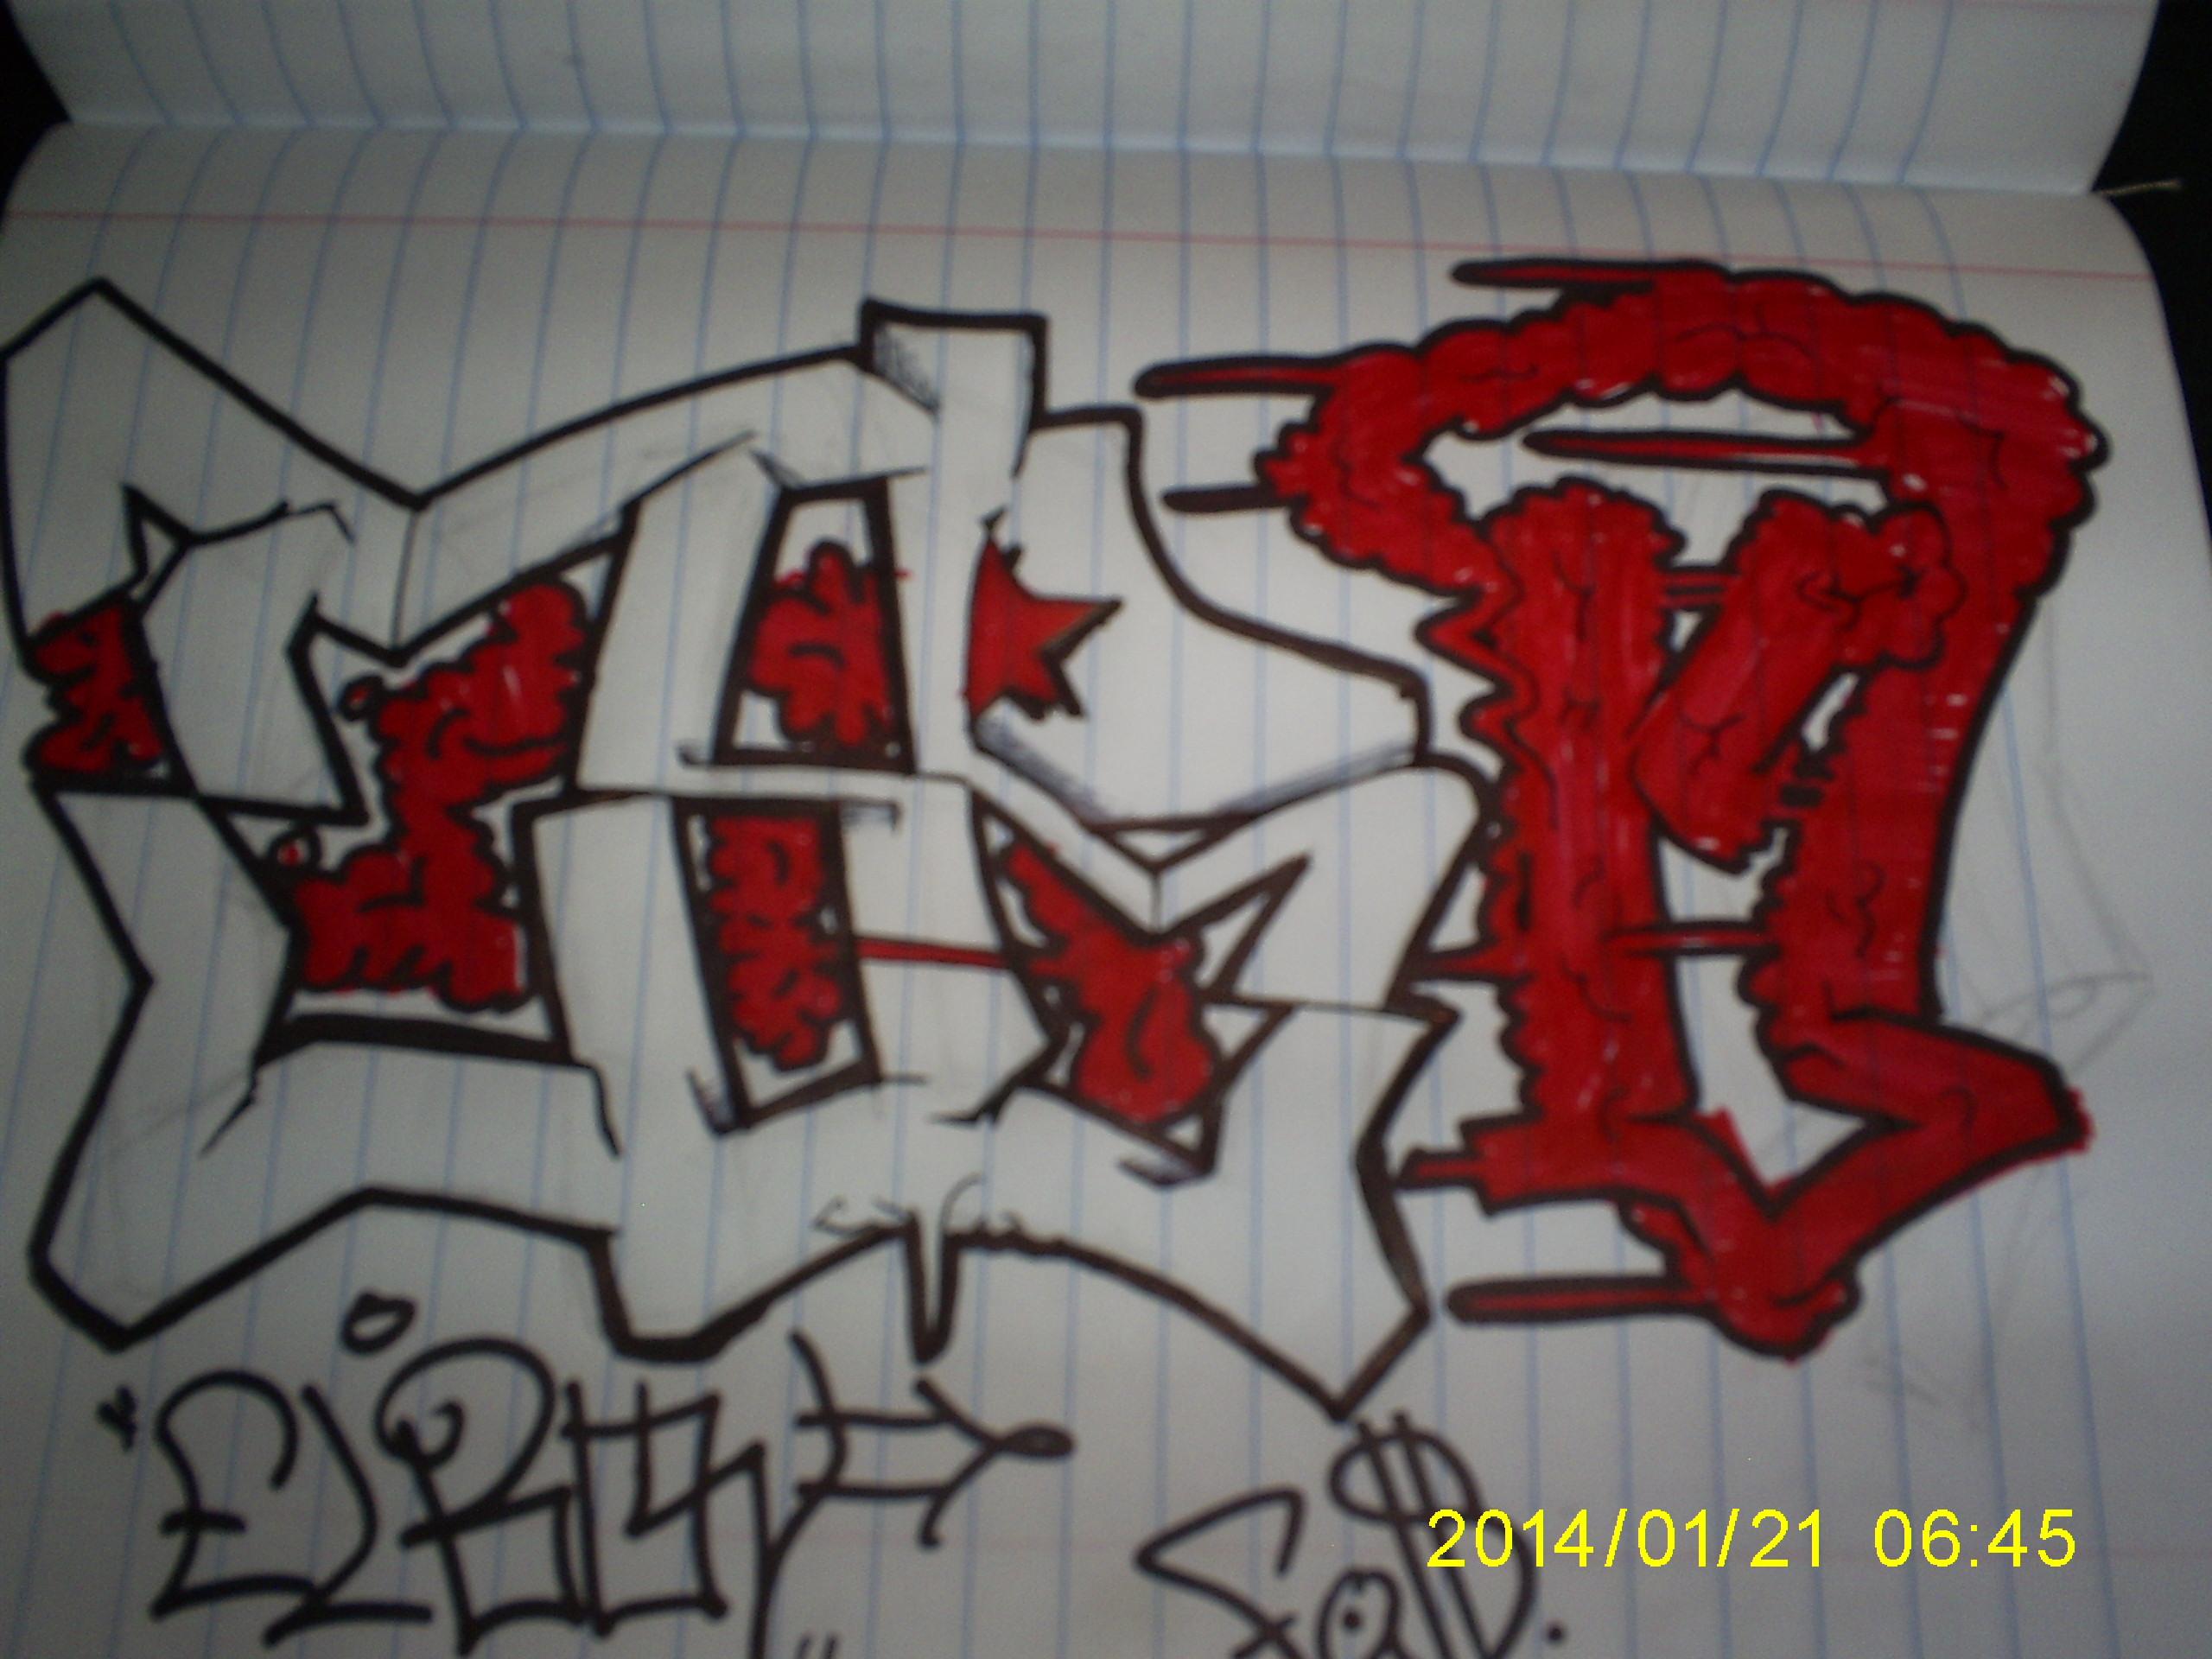 afarm6.staticflickr.com_5504_12088015564_c3c1f3d3d8_o.jpg